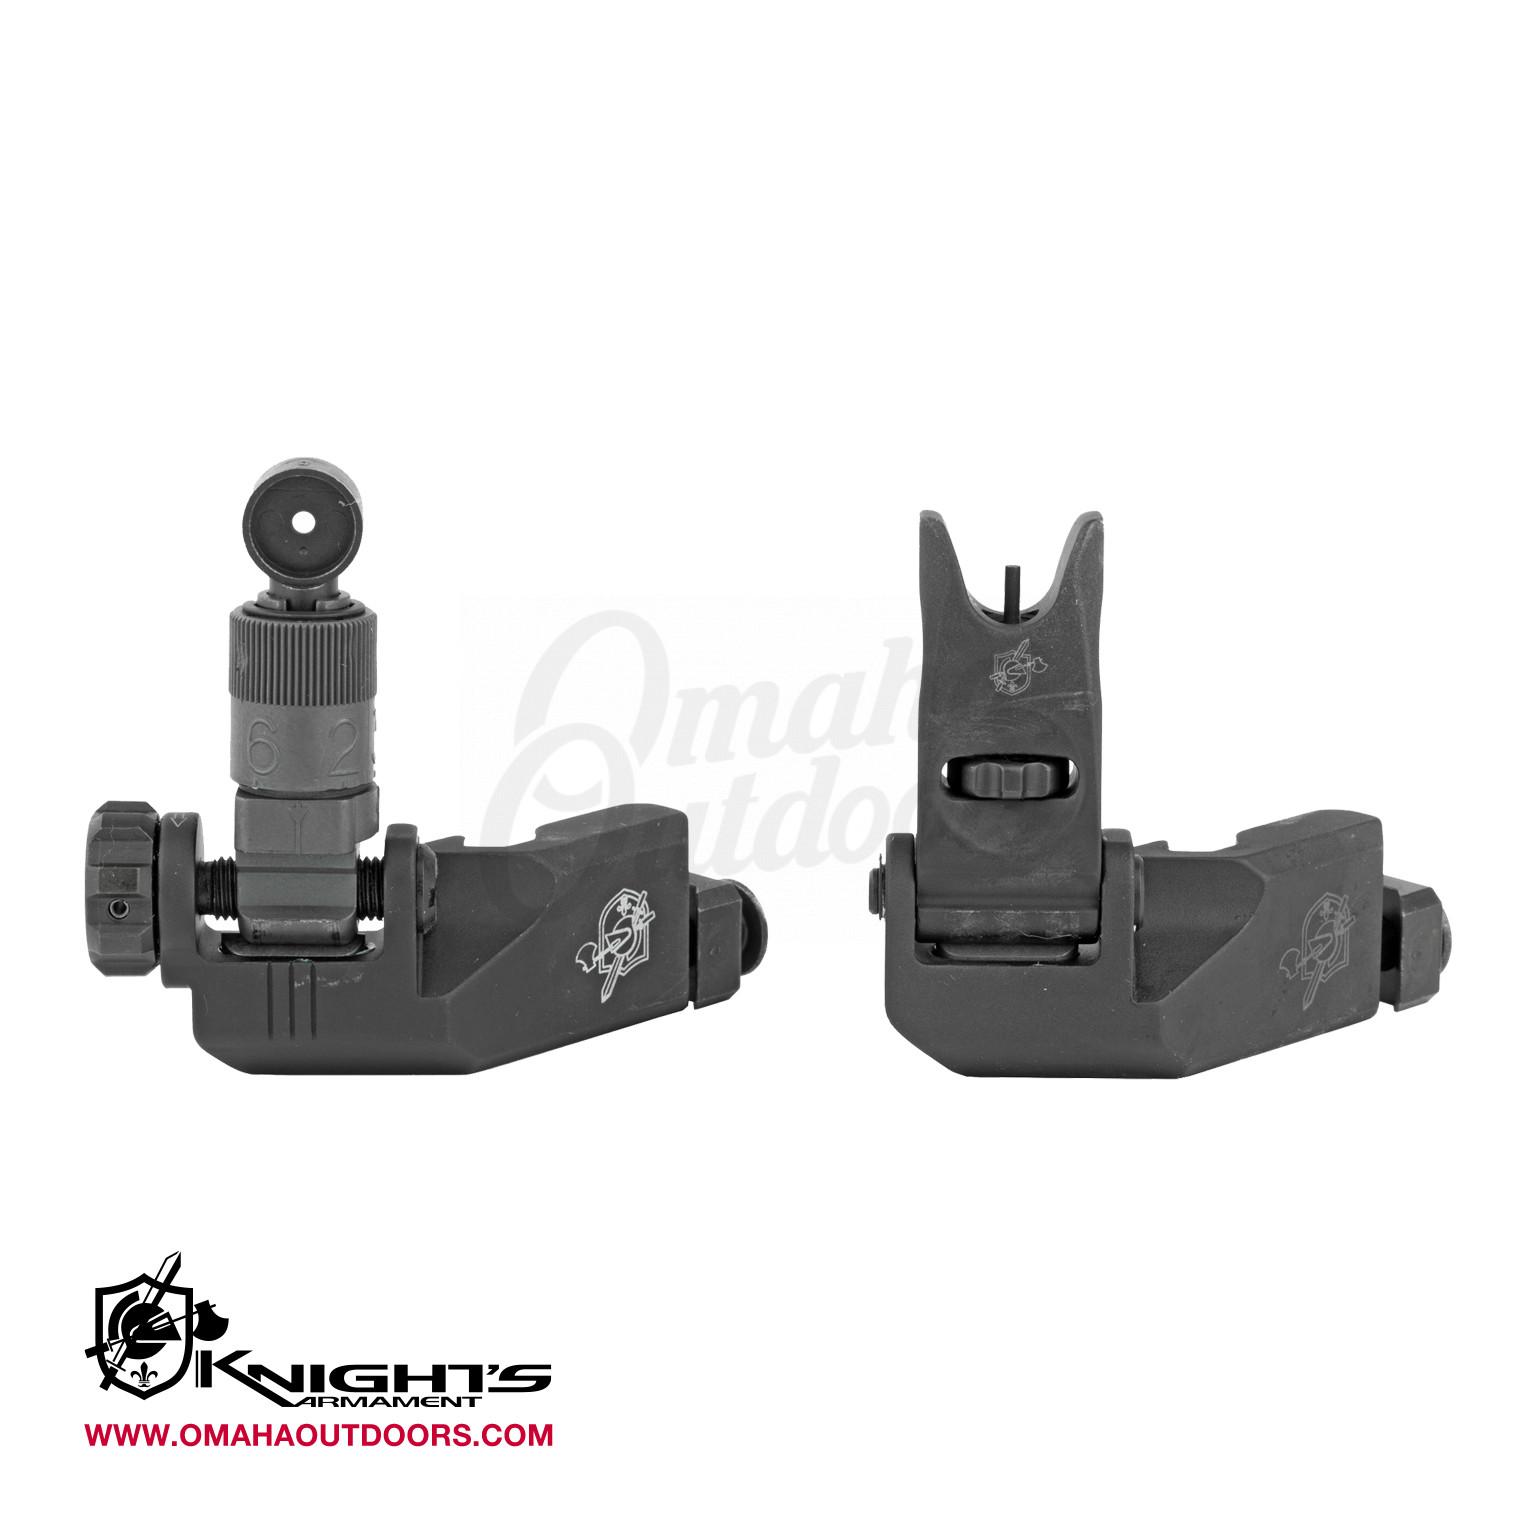 KAC 45 Degree Offset Folding Micro Sight Kit 200-600 Meter Adjustable AR-15  AR-10 Aluminum 31593